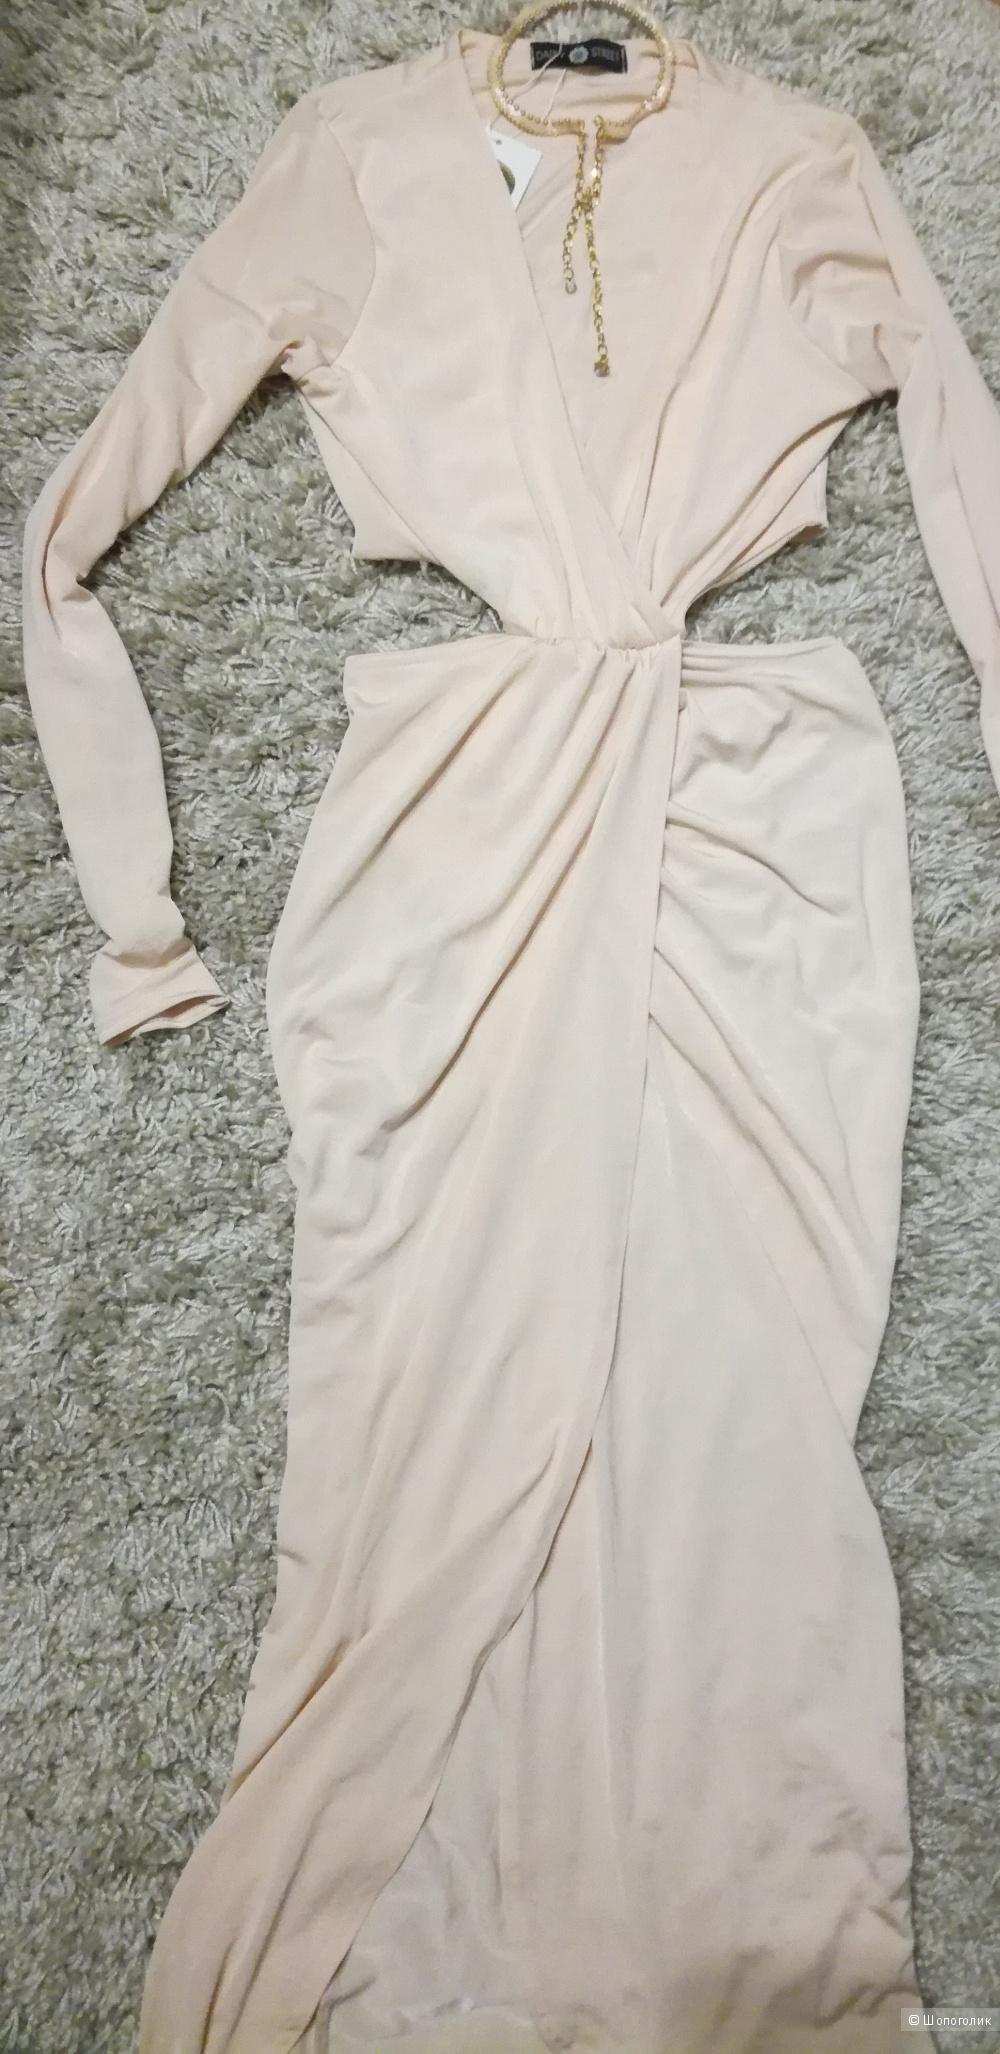 Новое платье Daisy street S/42-44